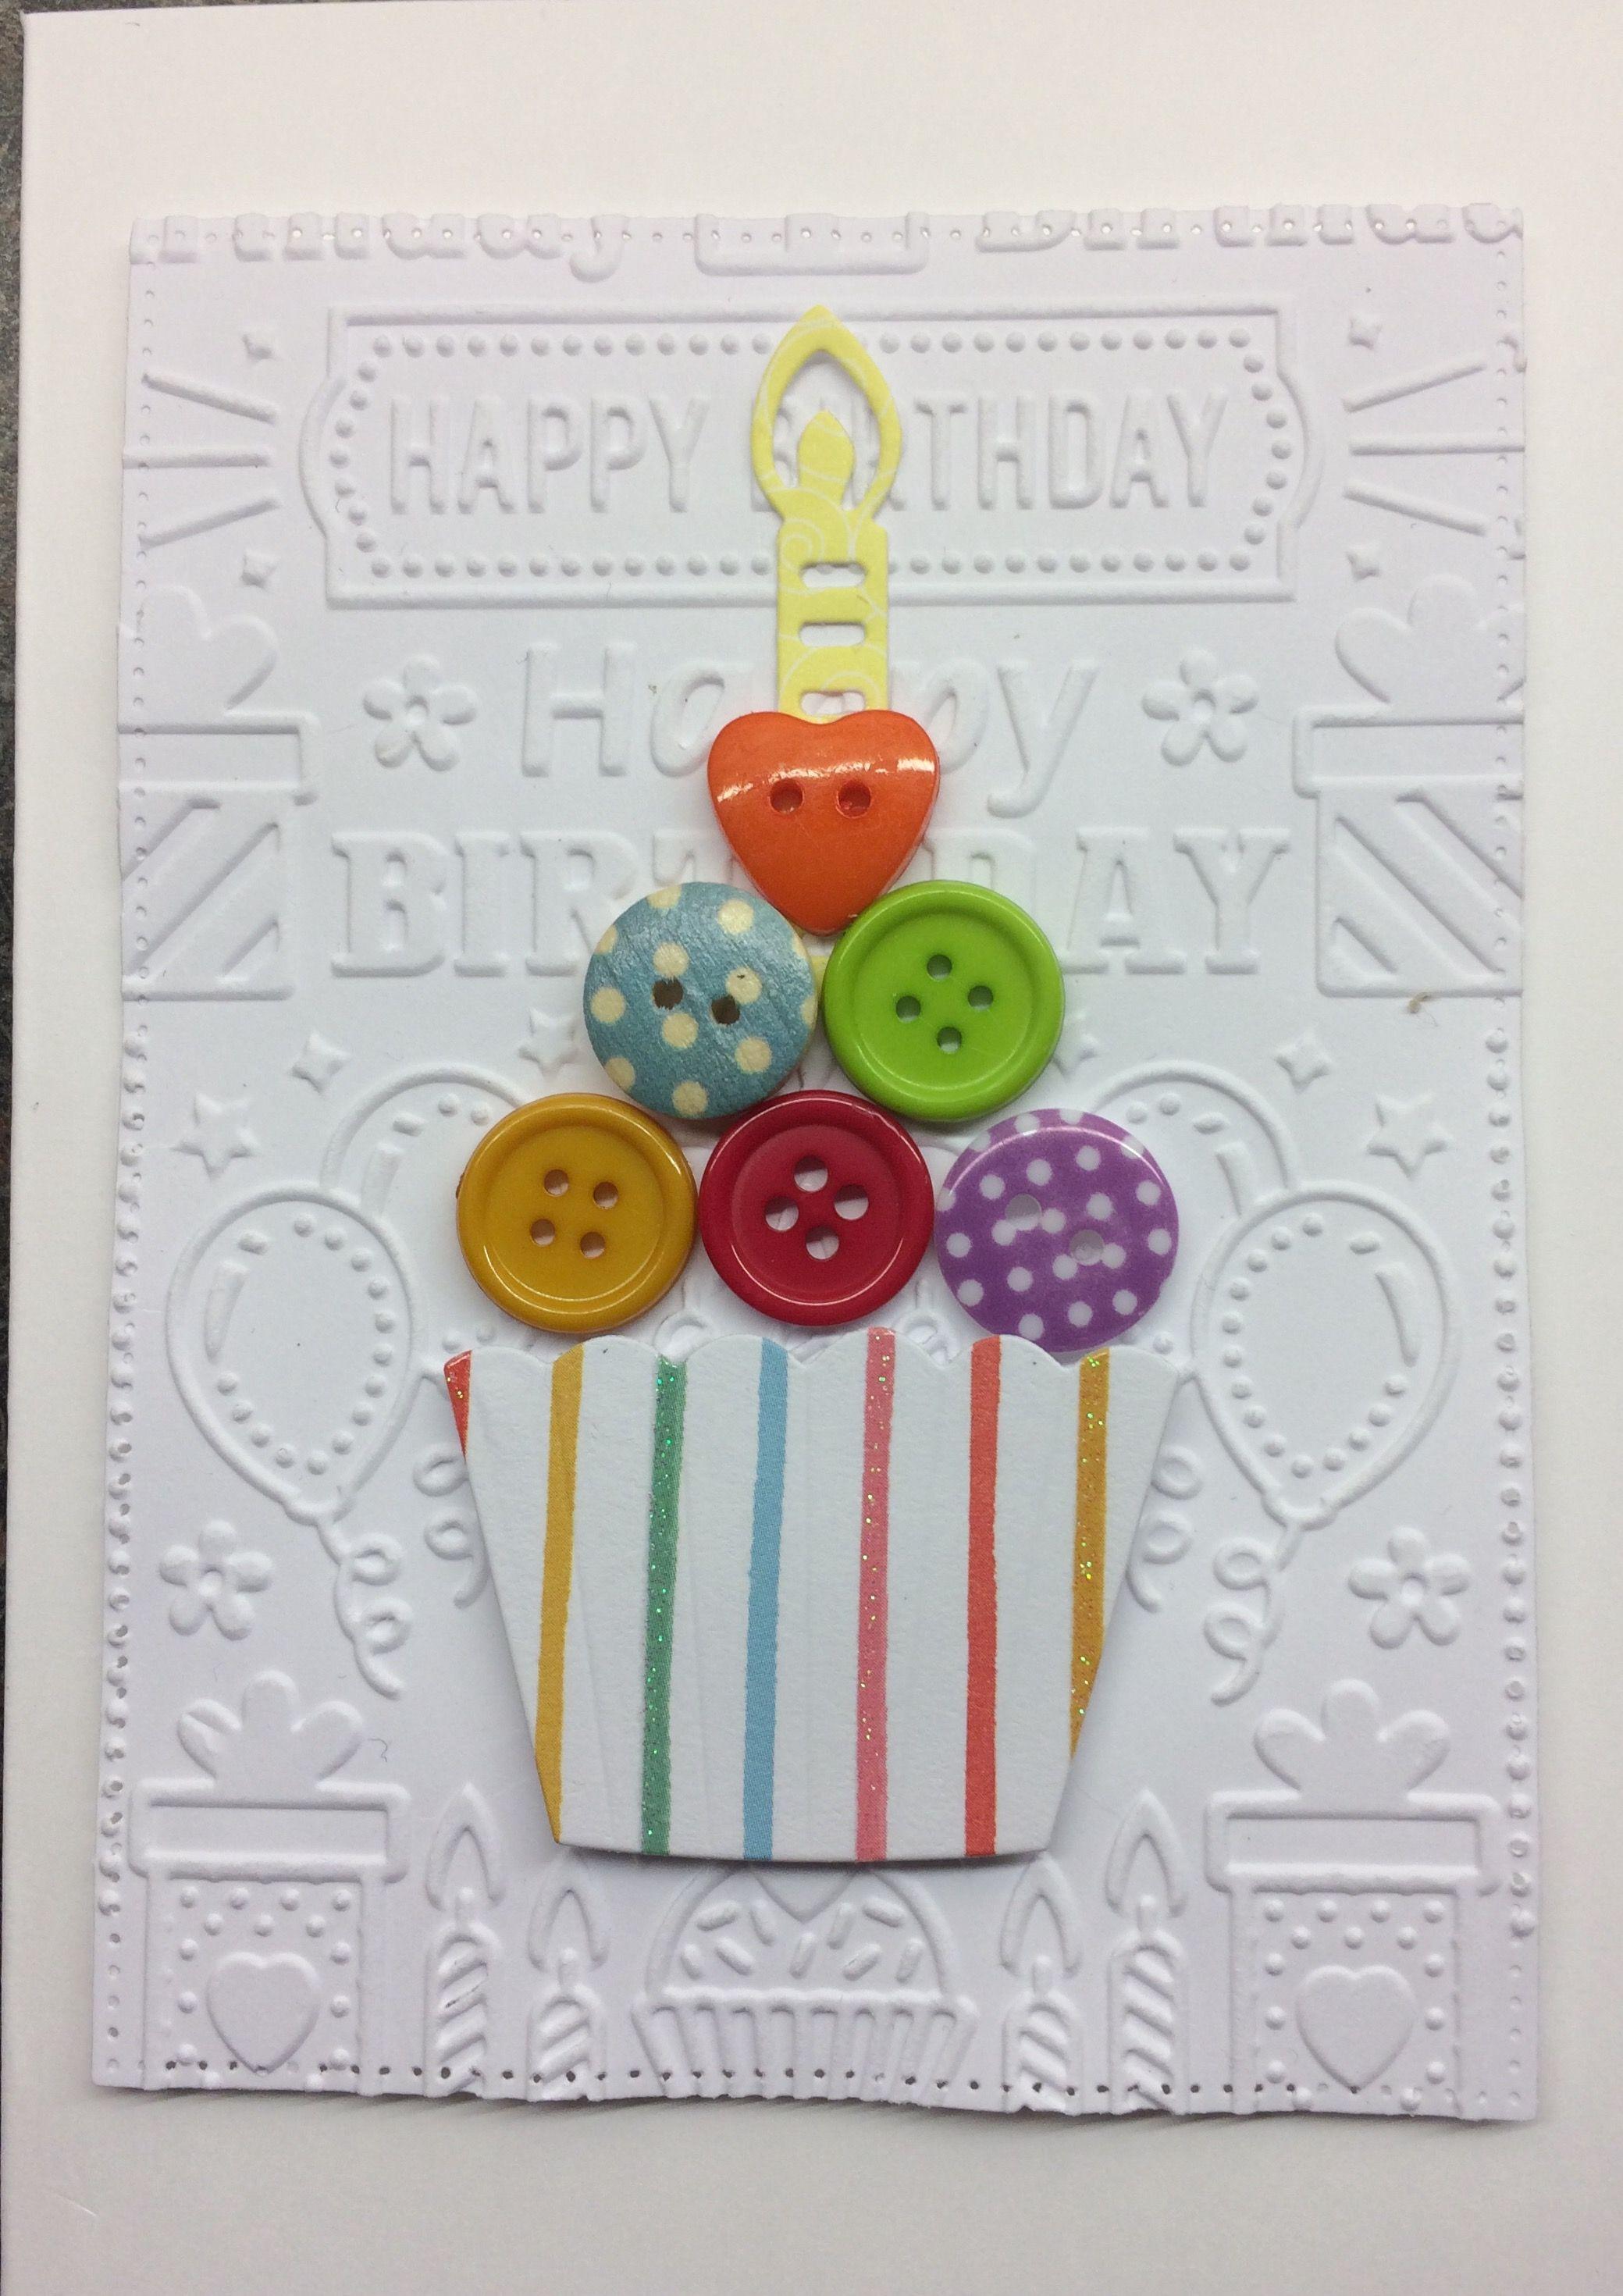 Best Friend Birthday Pebble Art Card Unique Handmade Card For Etsy Unique Handmade Cards Best Friend Birthday Cards Birthday Cards For Friends